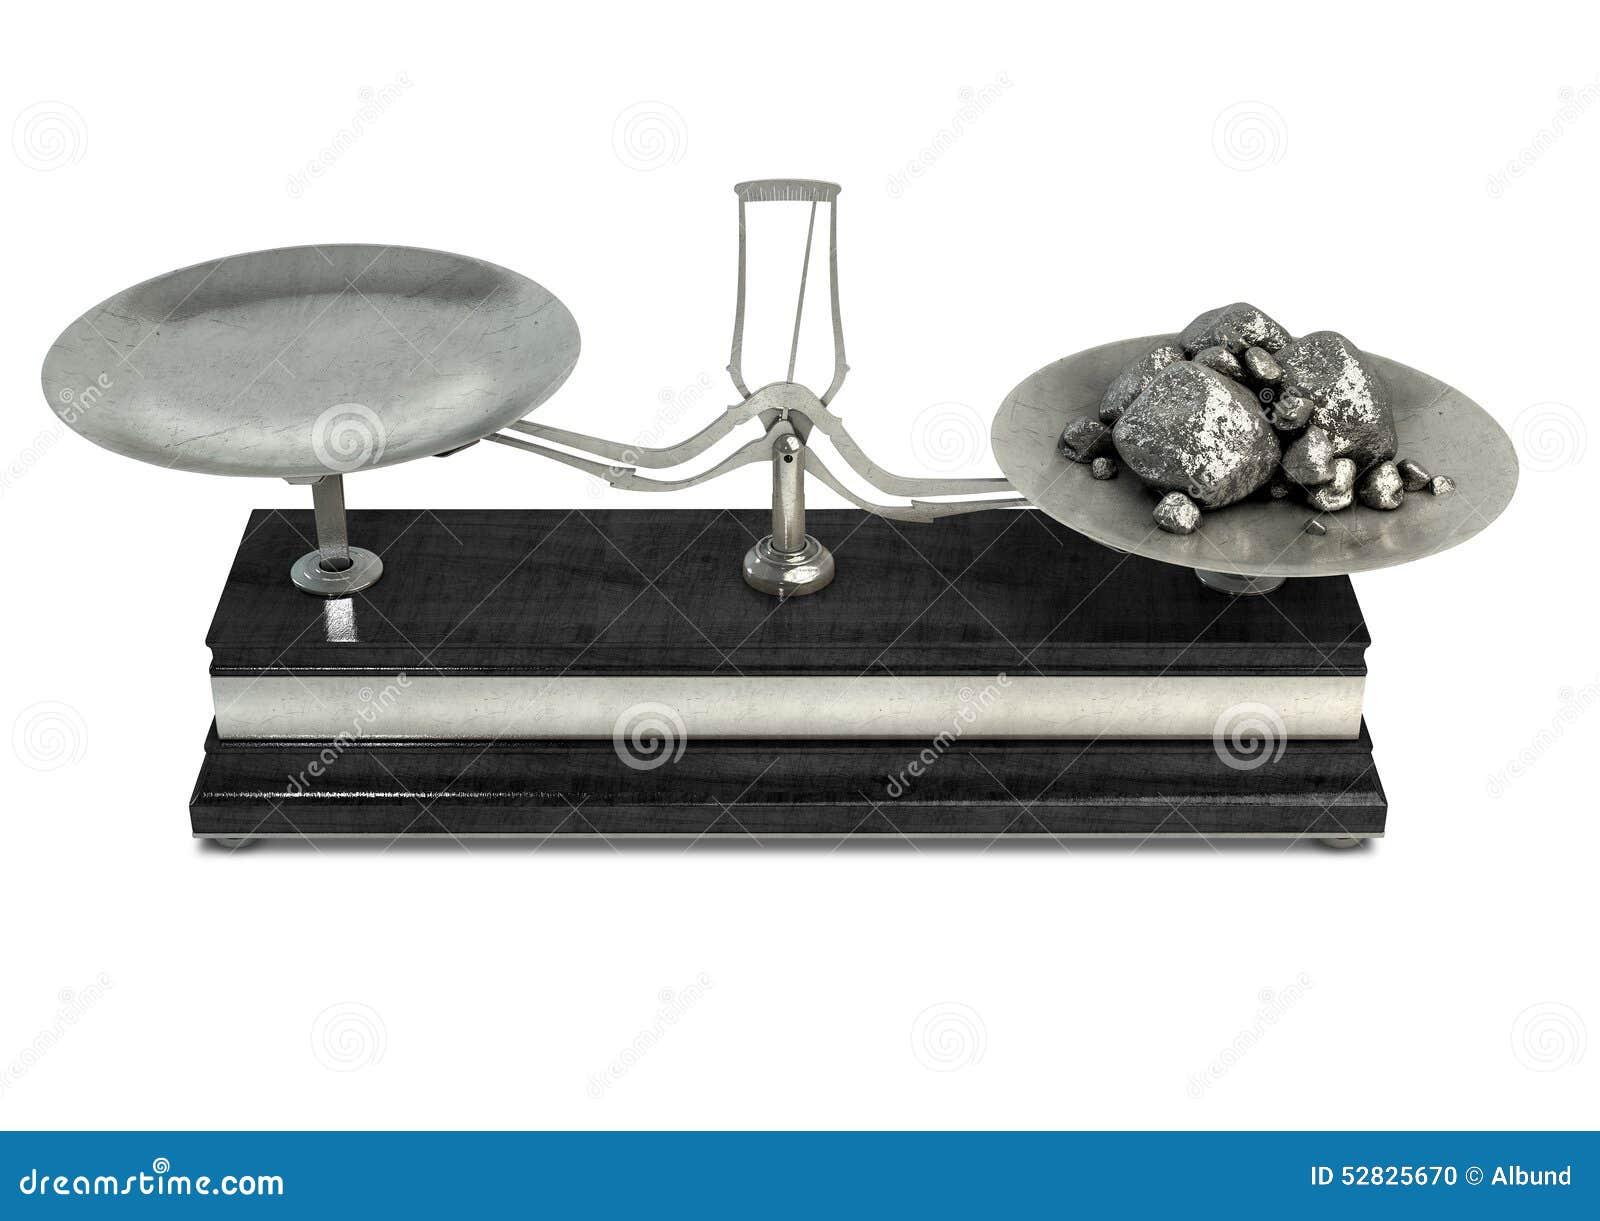 pan balance scale - photo #13